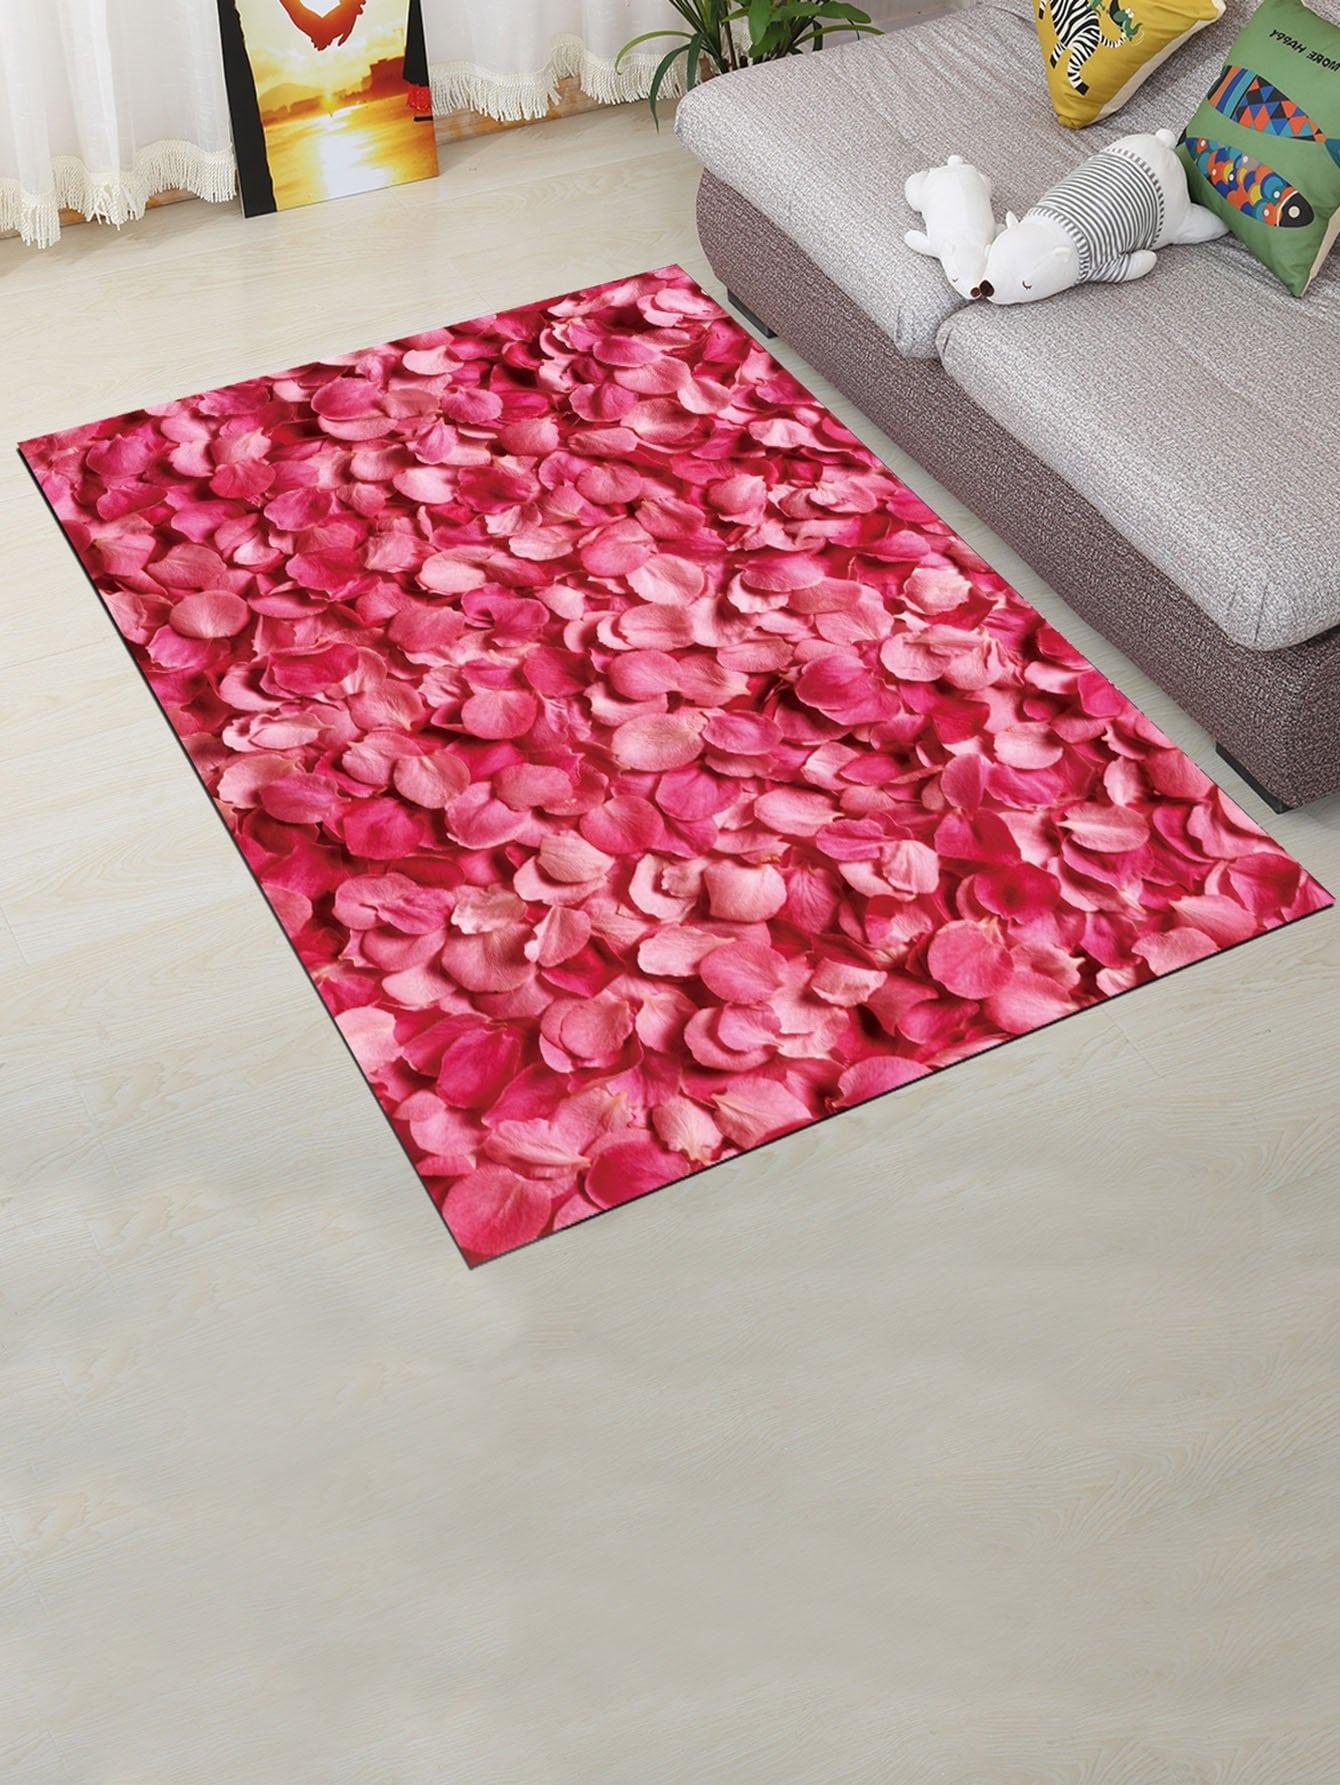 Petal Overlay Mat feather overlay print door mat